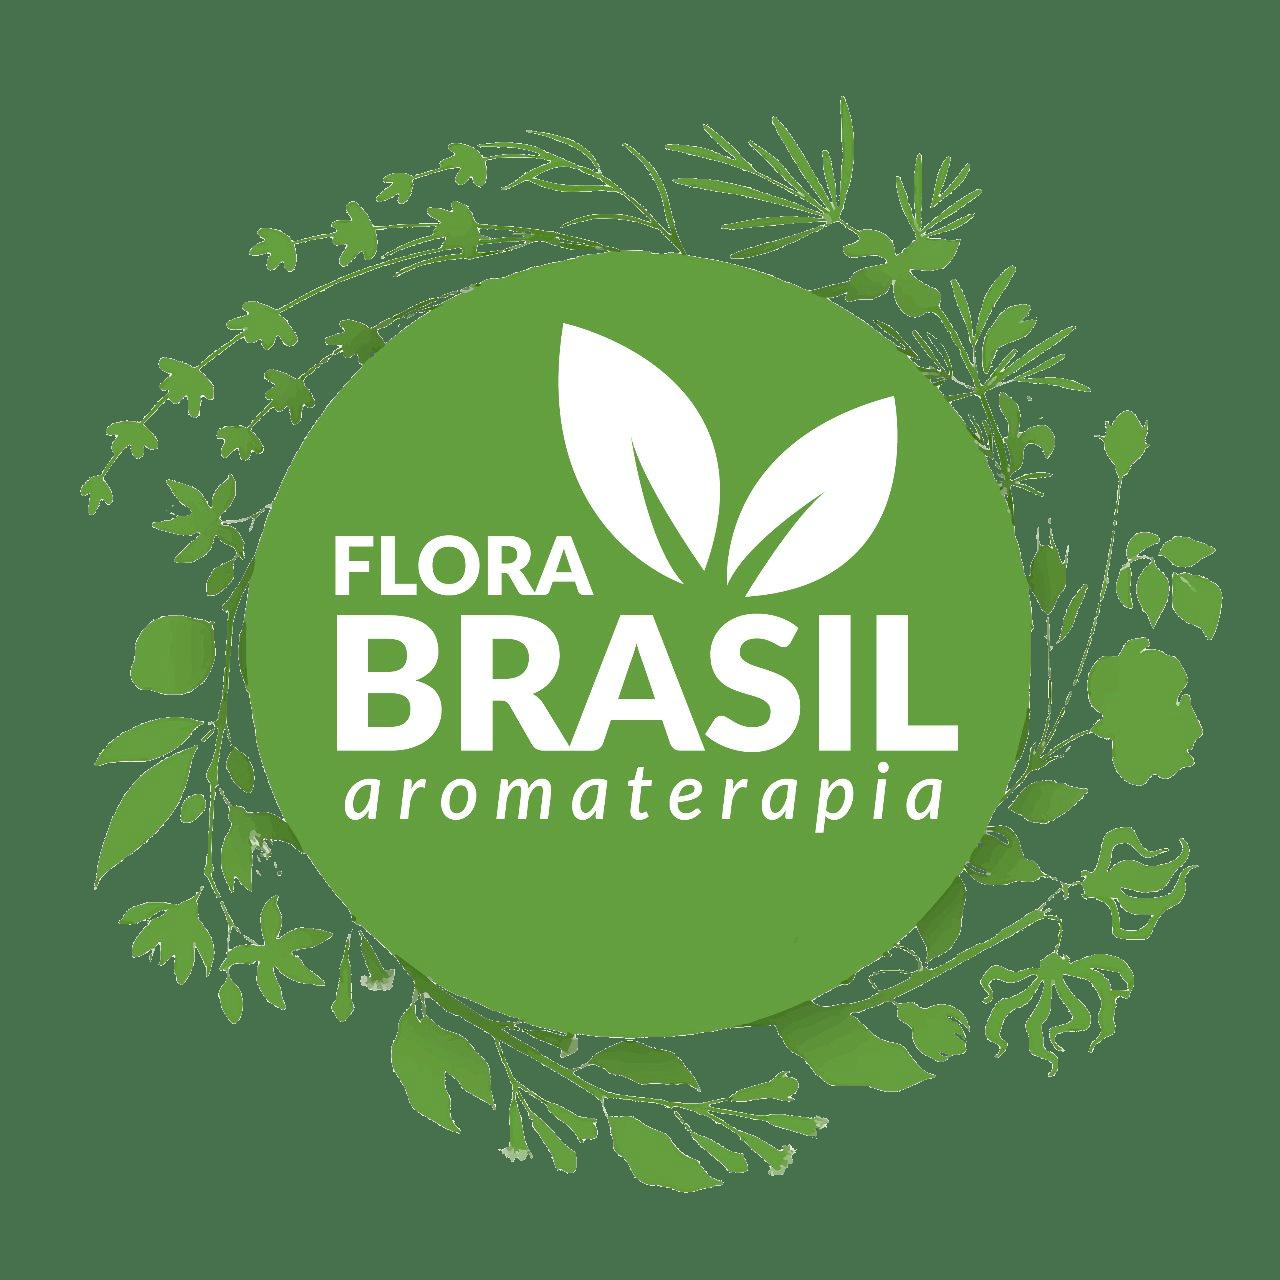 Flora Brasil Aromaterapia